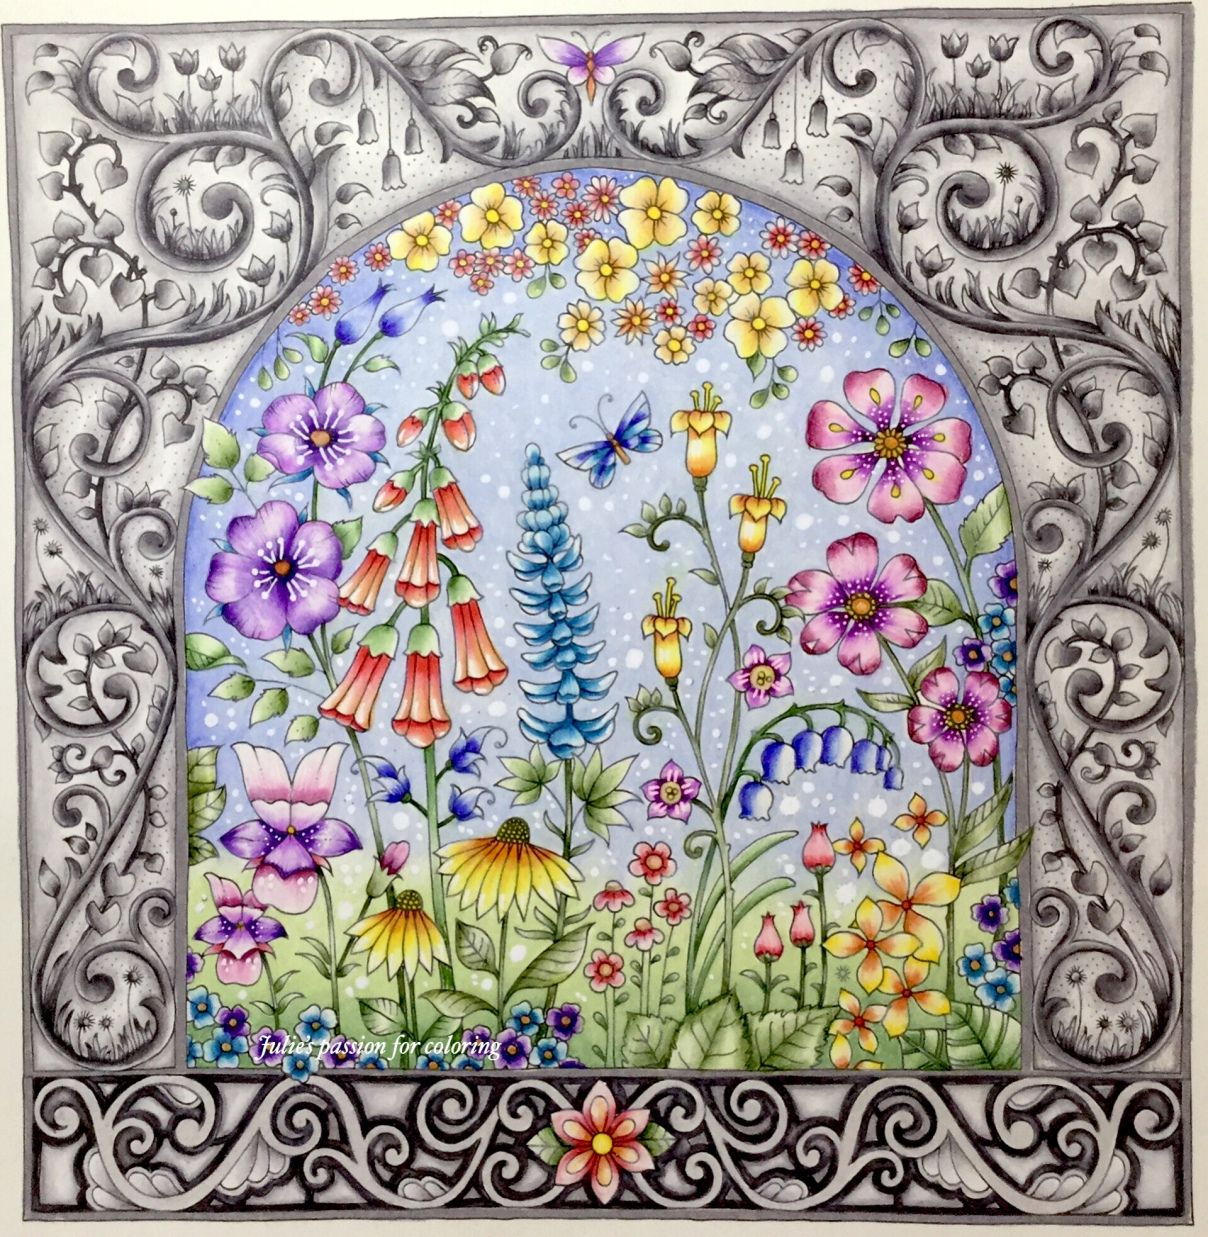 Pin on cb johanna basford world of flowers